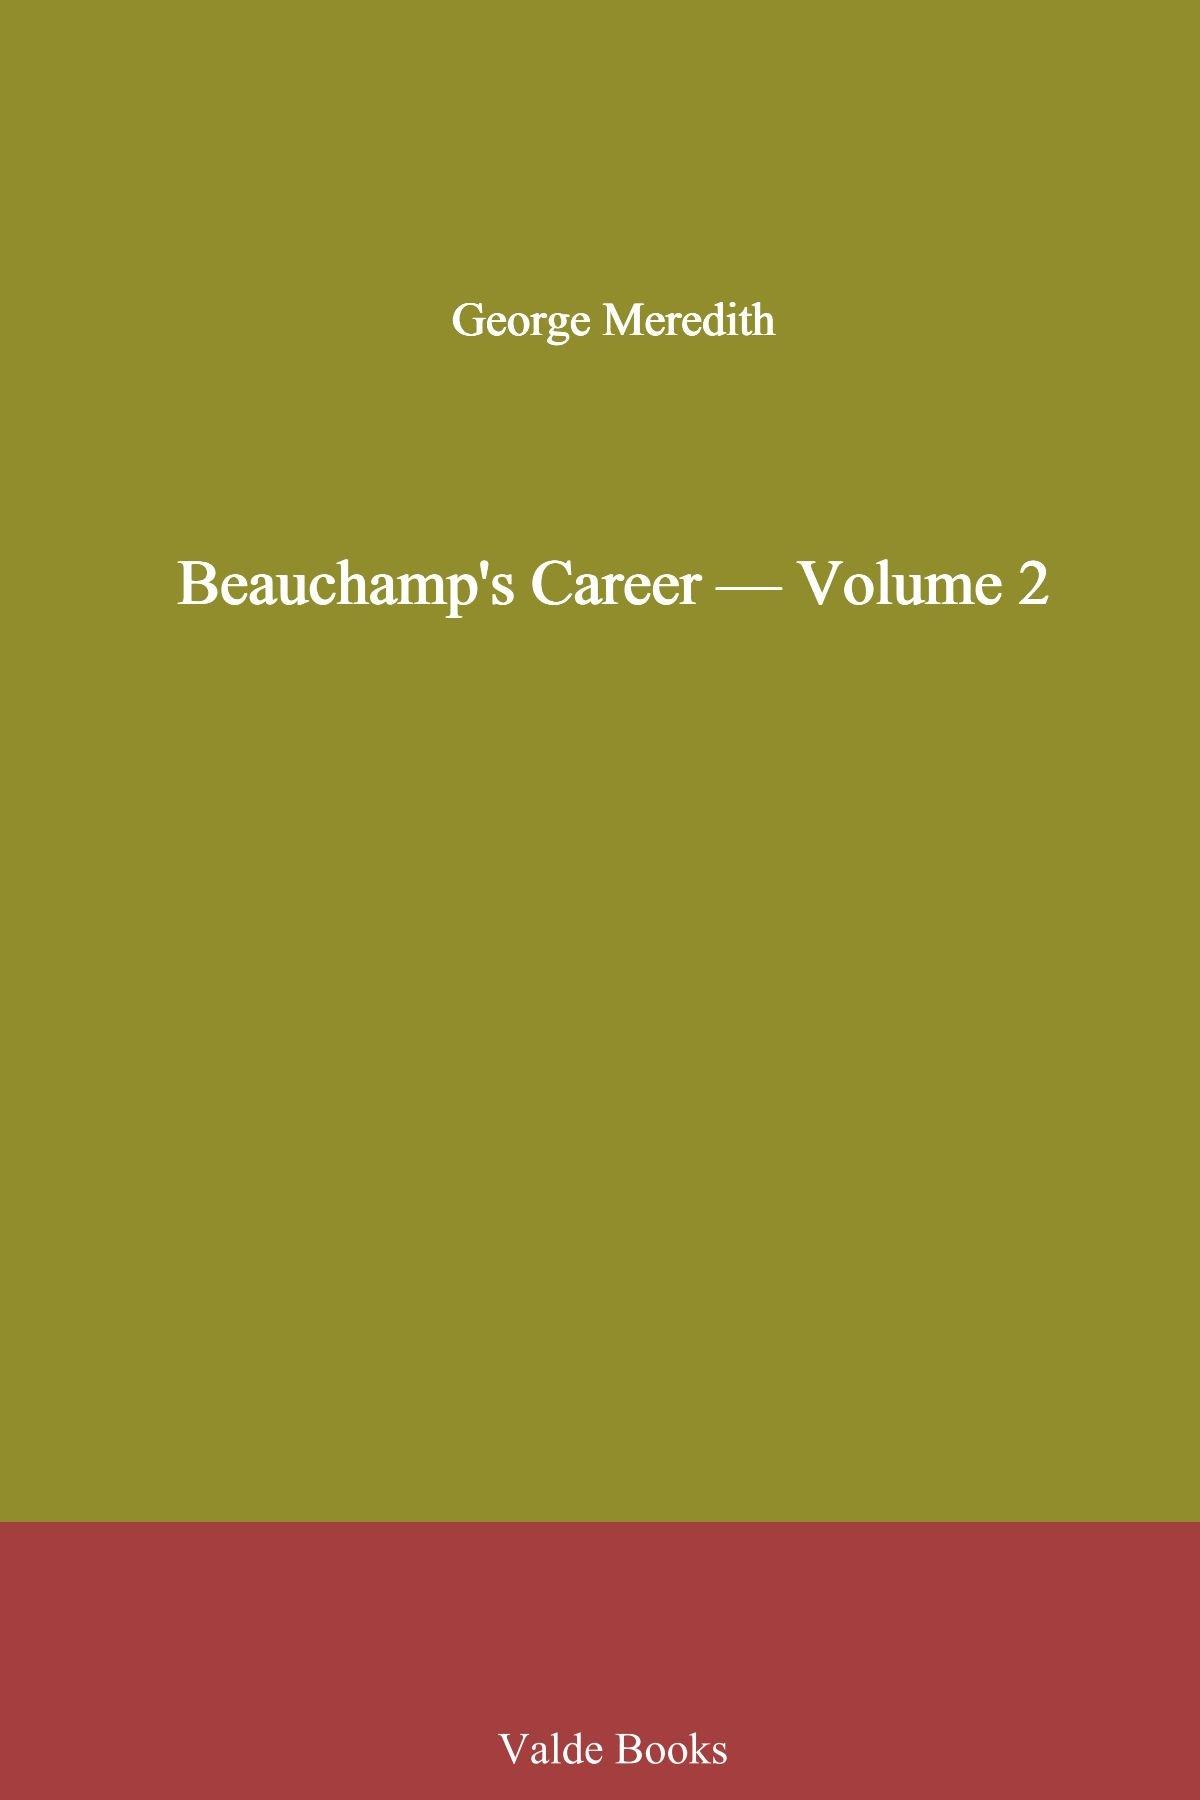 Download Beauchamp's Career - Volume 2 ebook